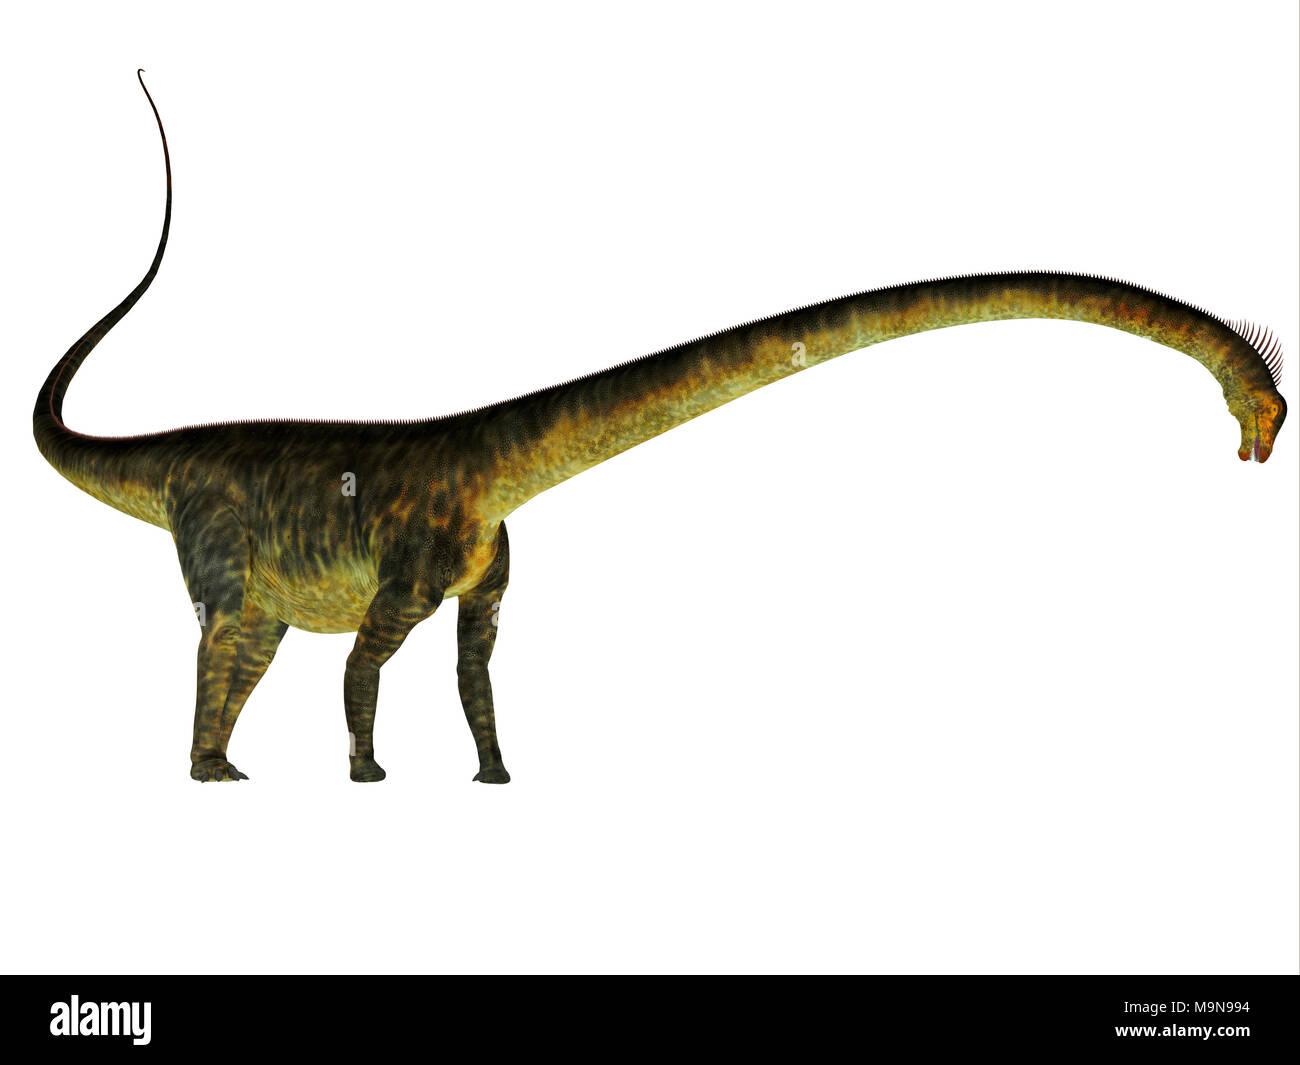 Barosaurus Dinosaur Side Profile - Barosaurus was a herbivorous sauropod dinosaur that lived in Utah and South Dakota, USA in the Jurassic Period. - Stock Image